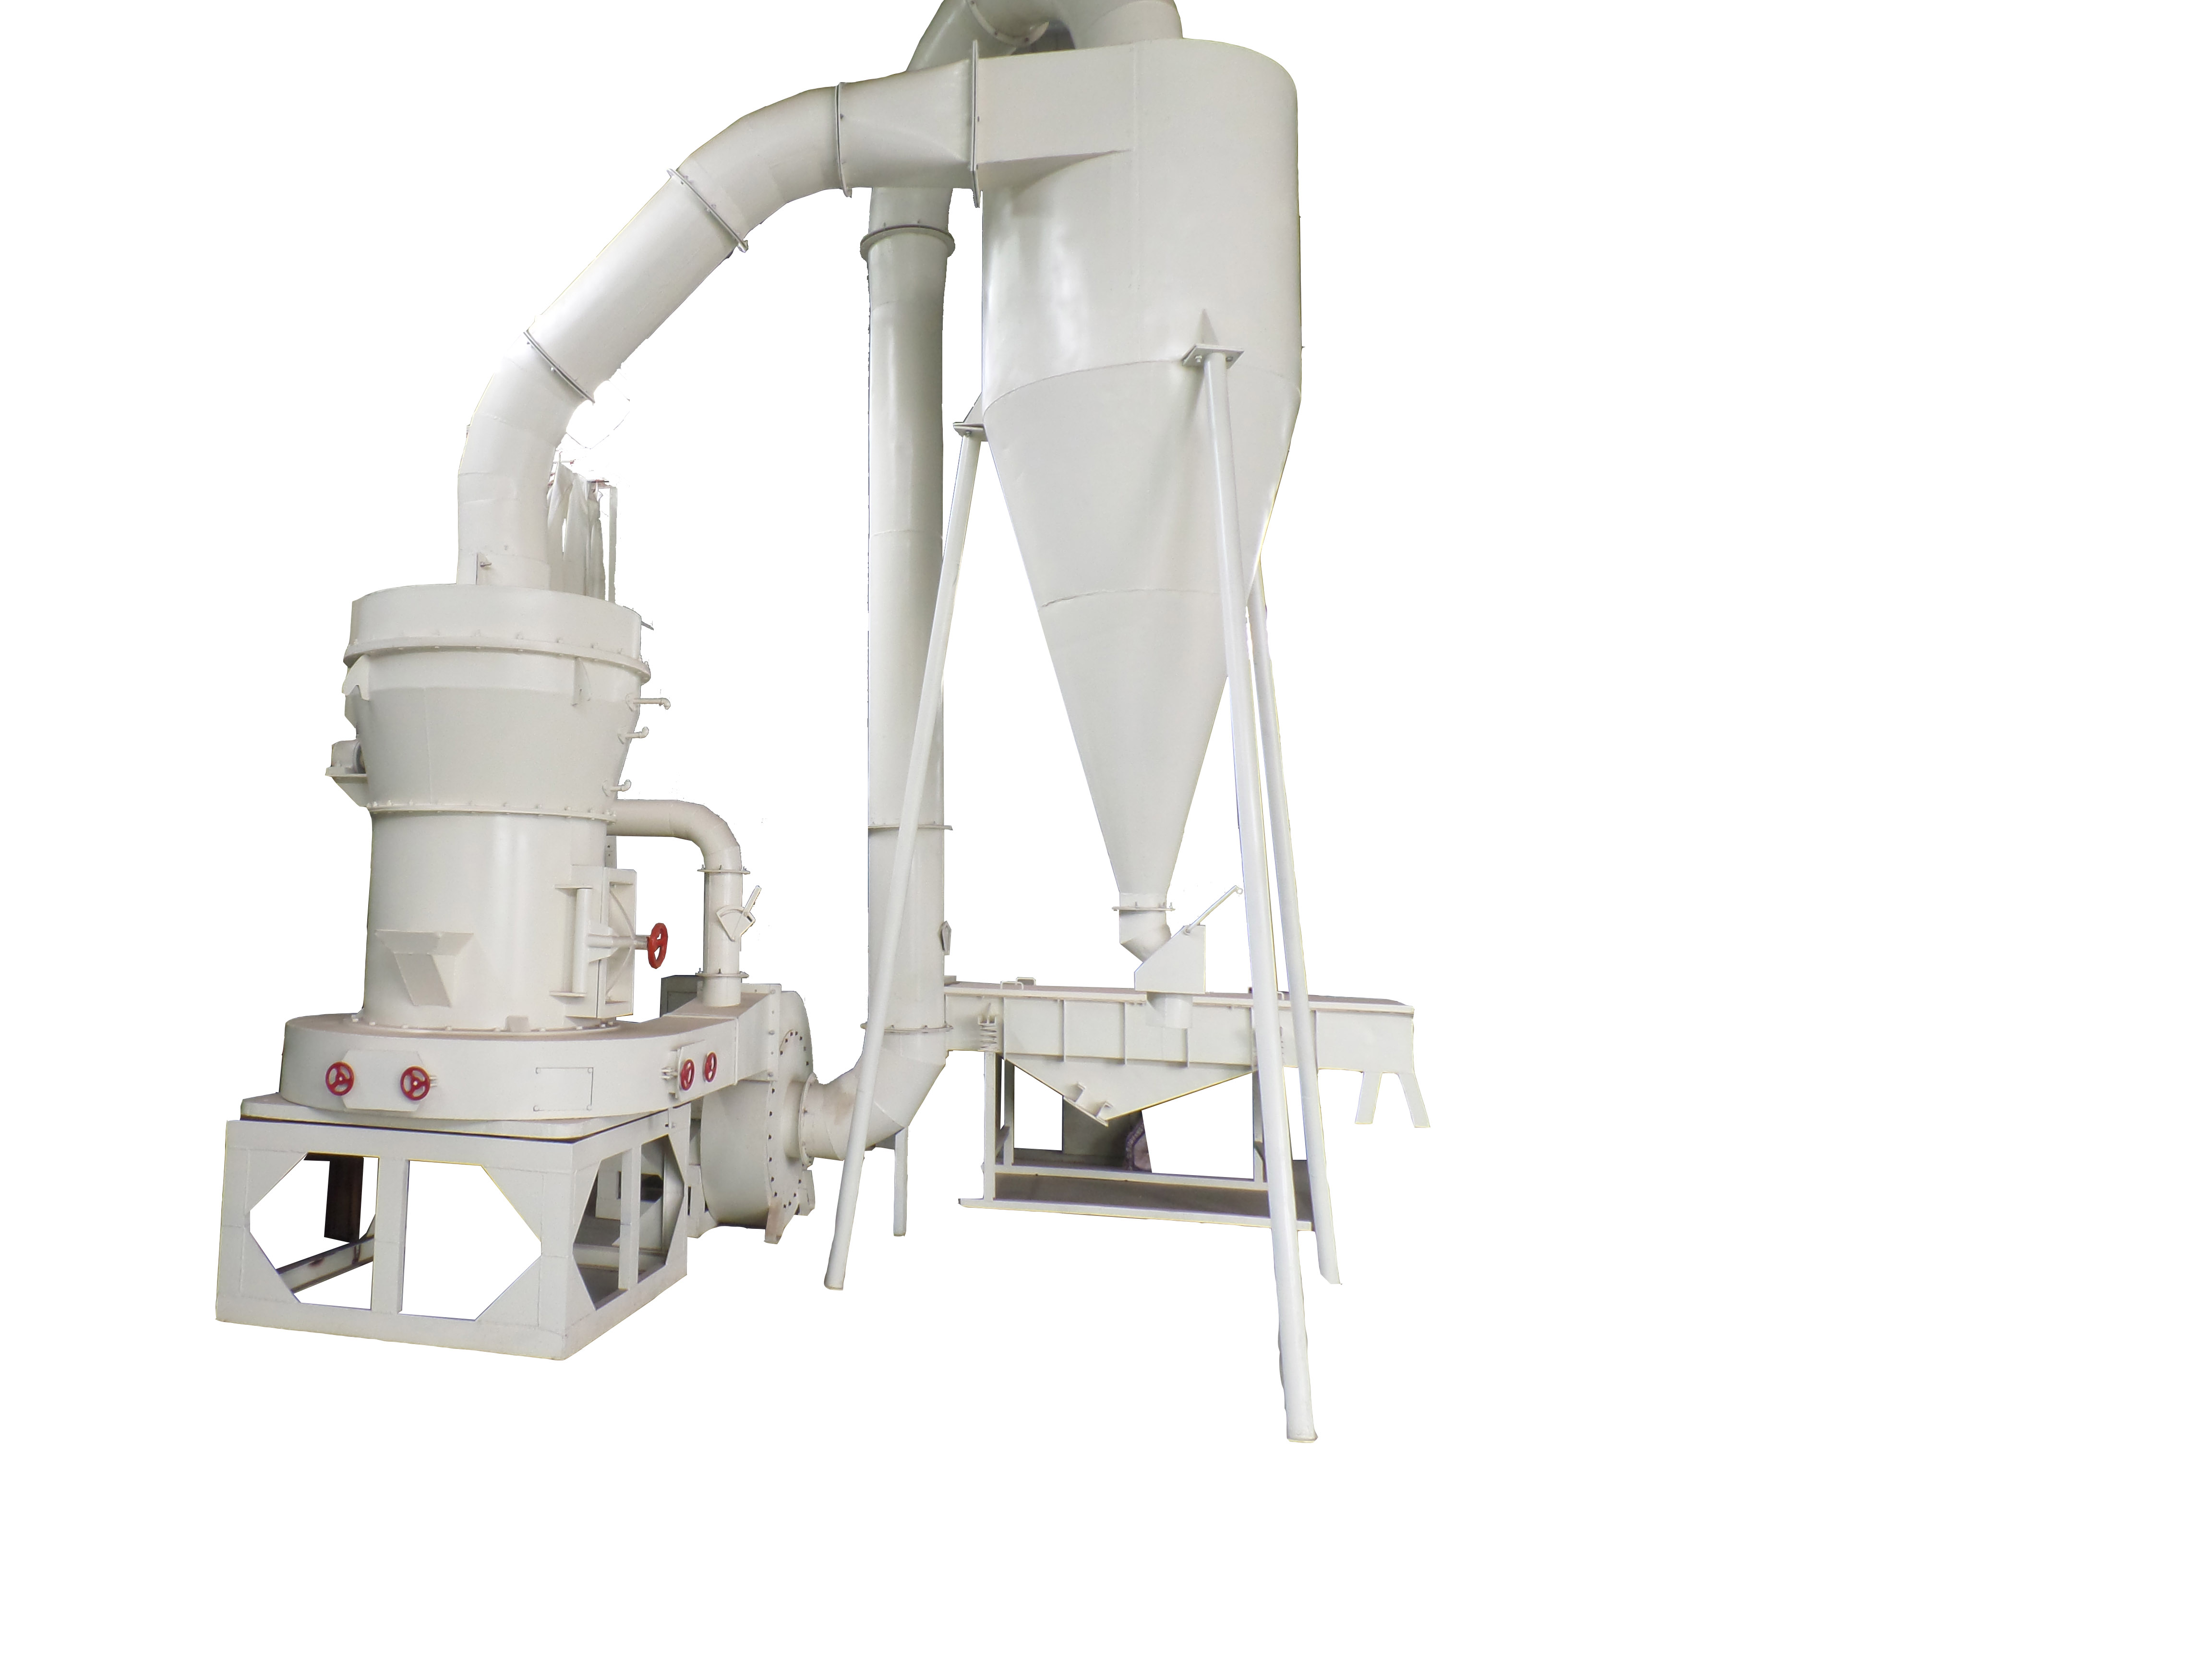 limestone Raymond mill,Calcium carbonate mill